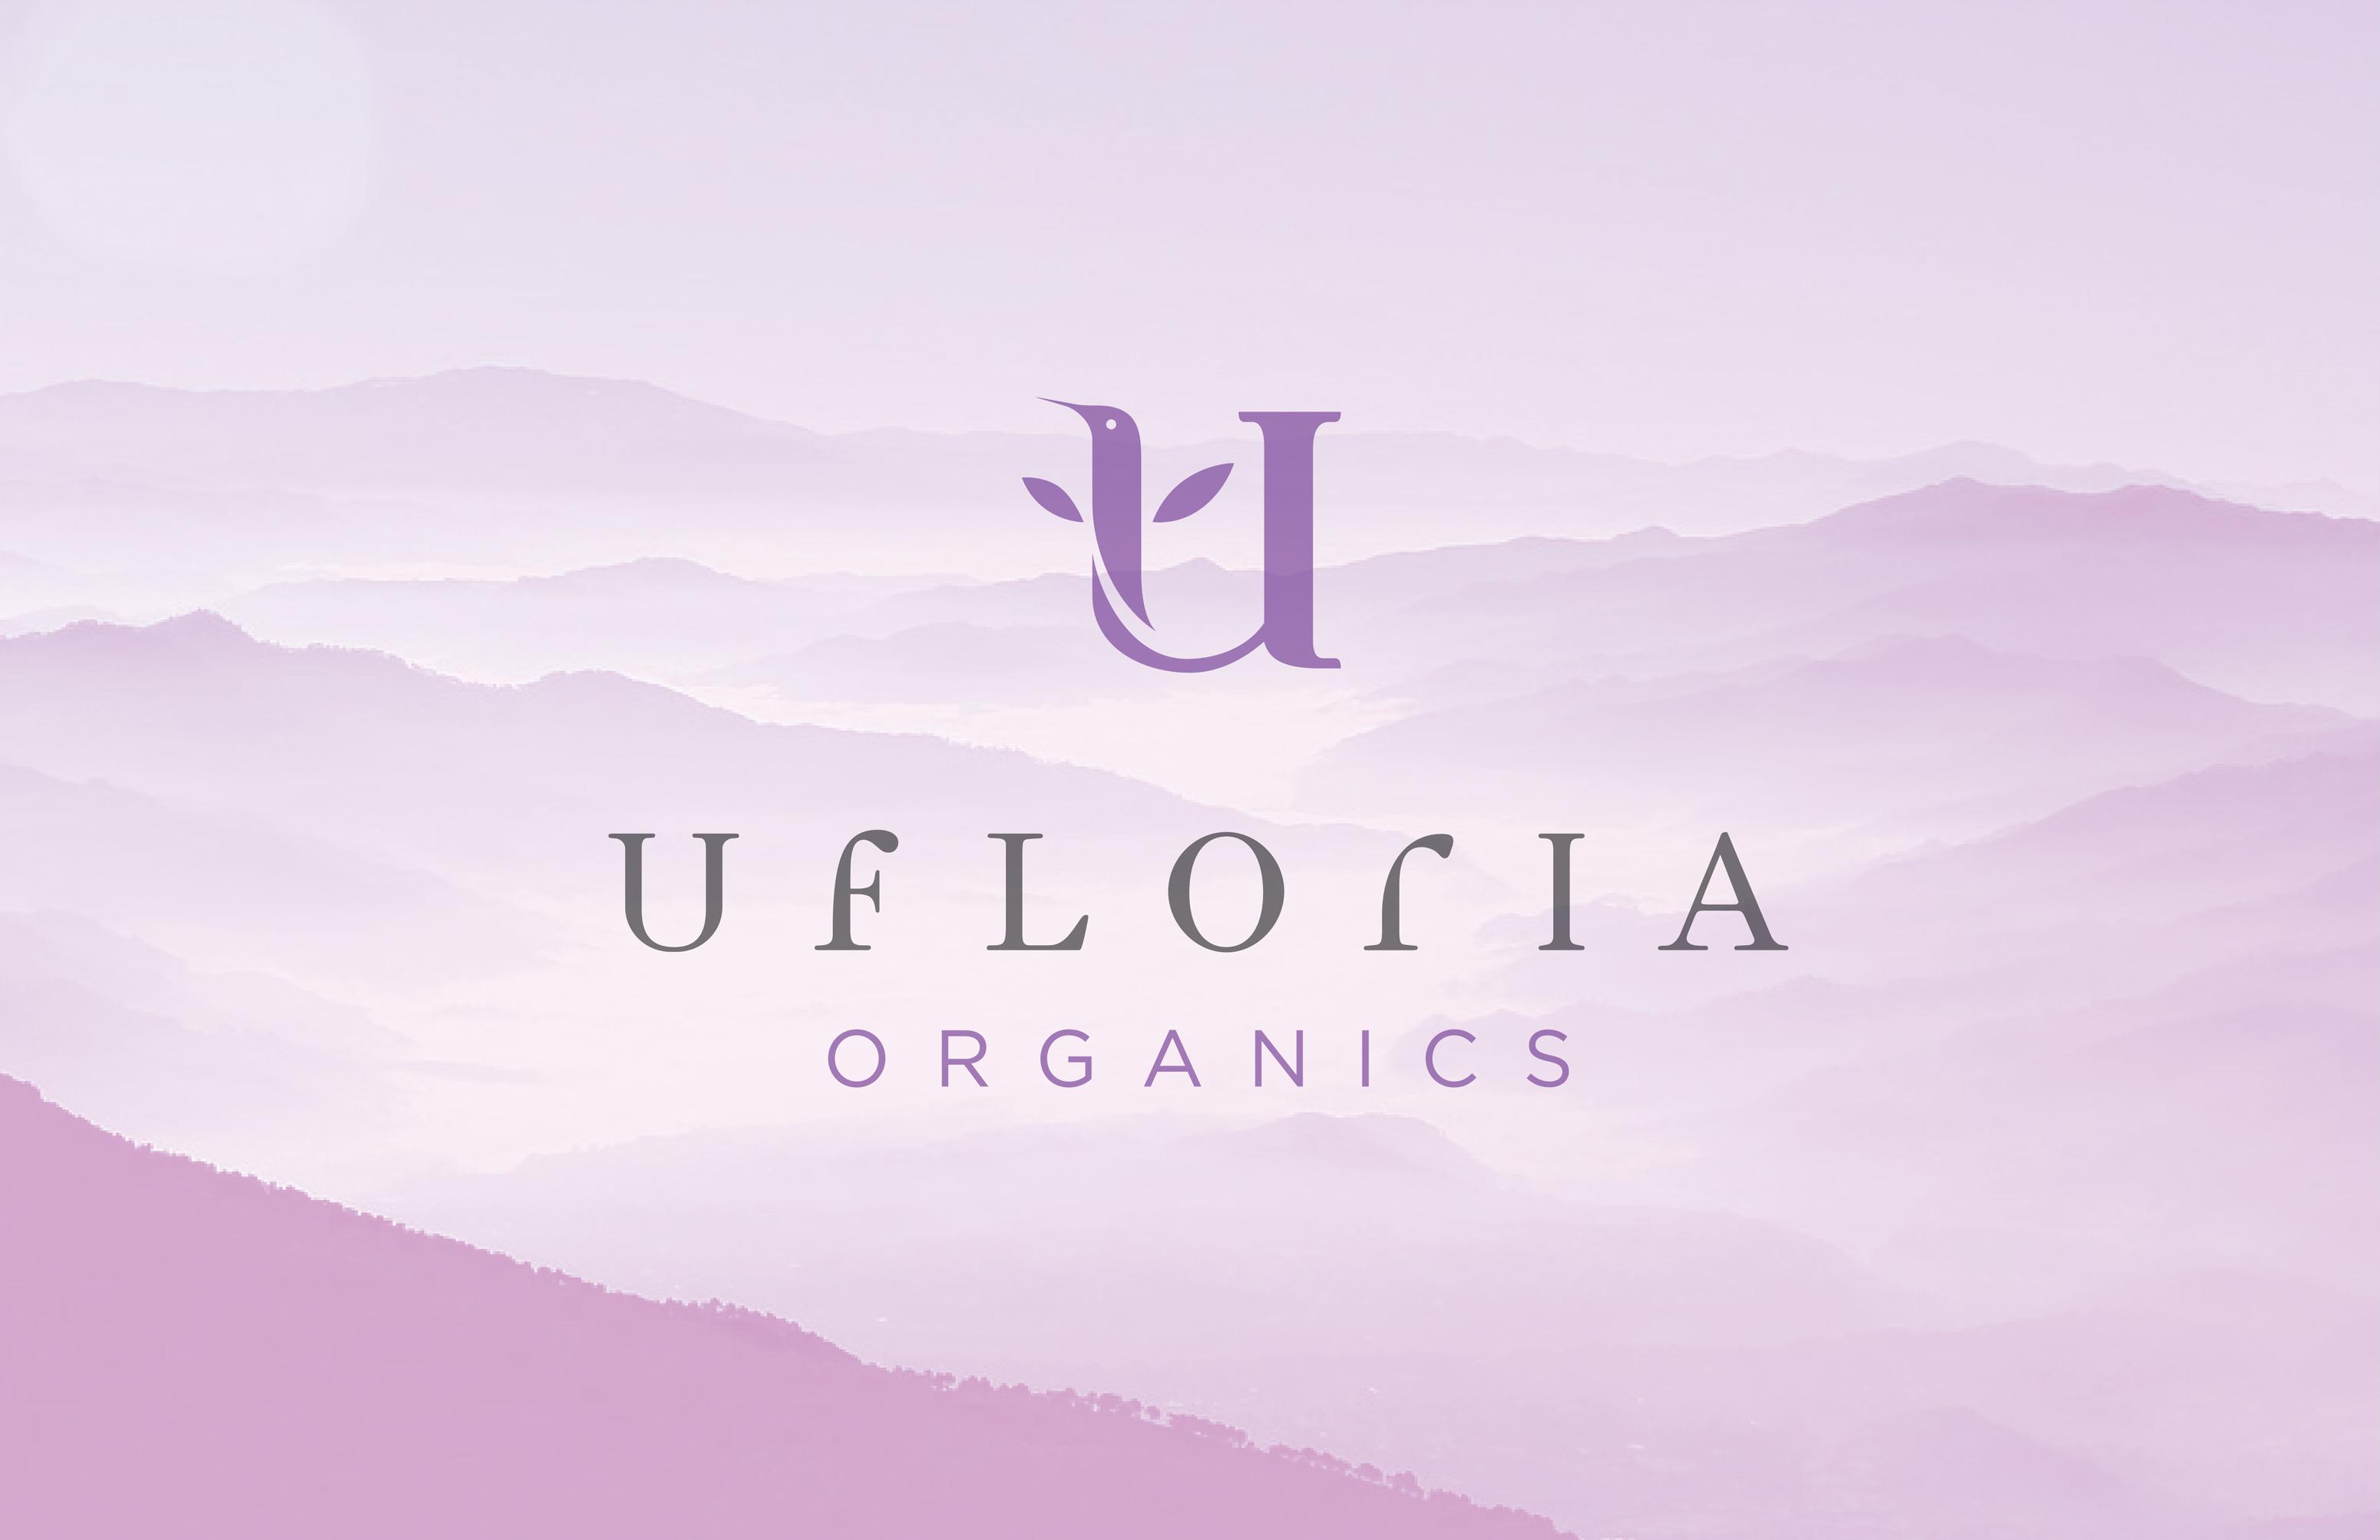 Yurika Creative Develops a Refreshing Brand Expression for Ufloria Organics